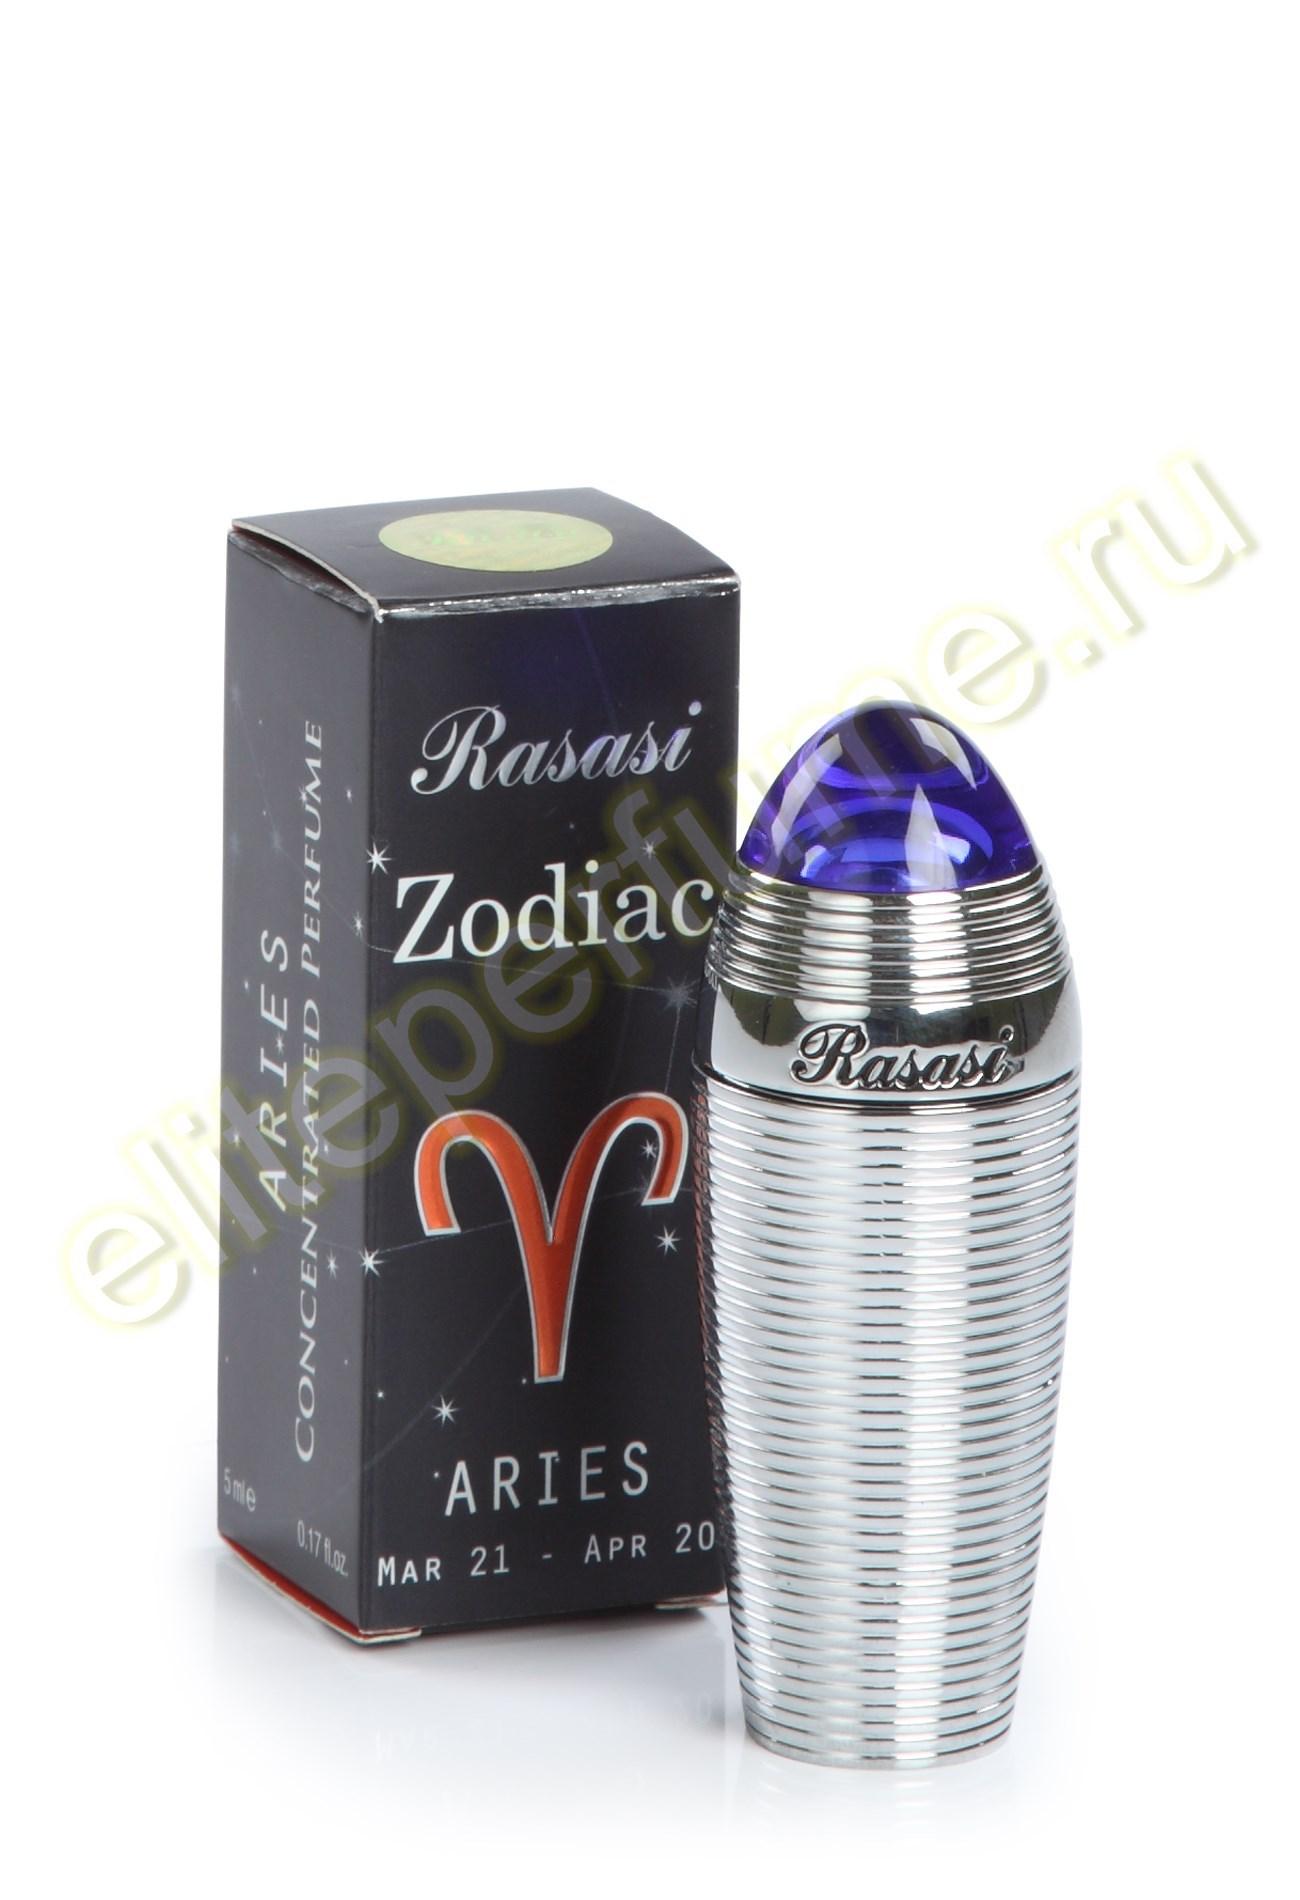 Пробники для арабских духов Зодиак Овен Zodiac Aries 1 мл арабские масляные духи от Расаси Rasasi Perfumes